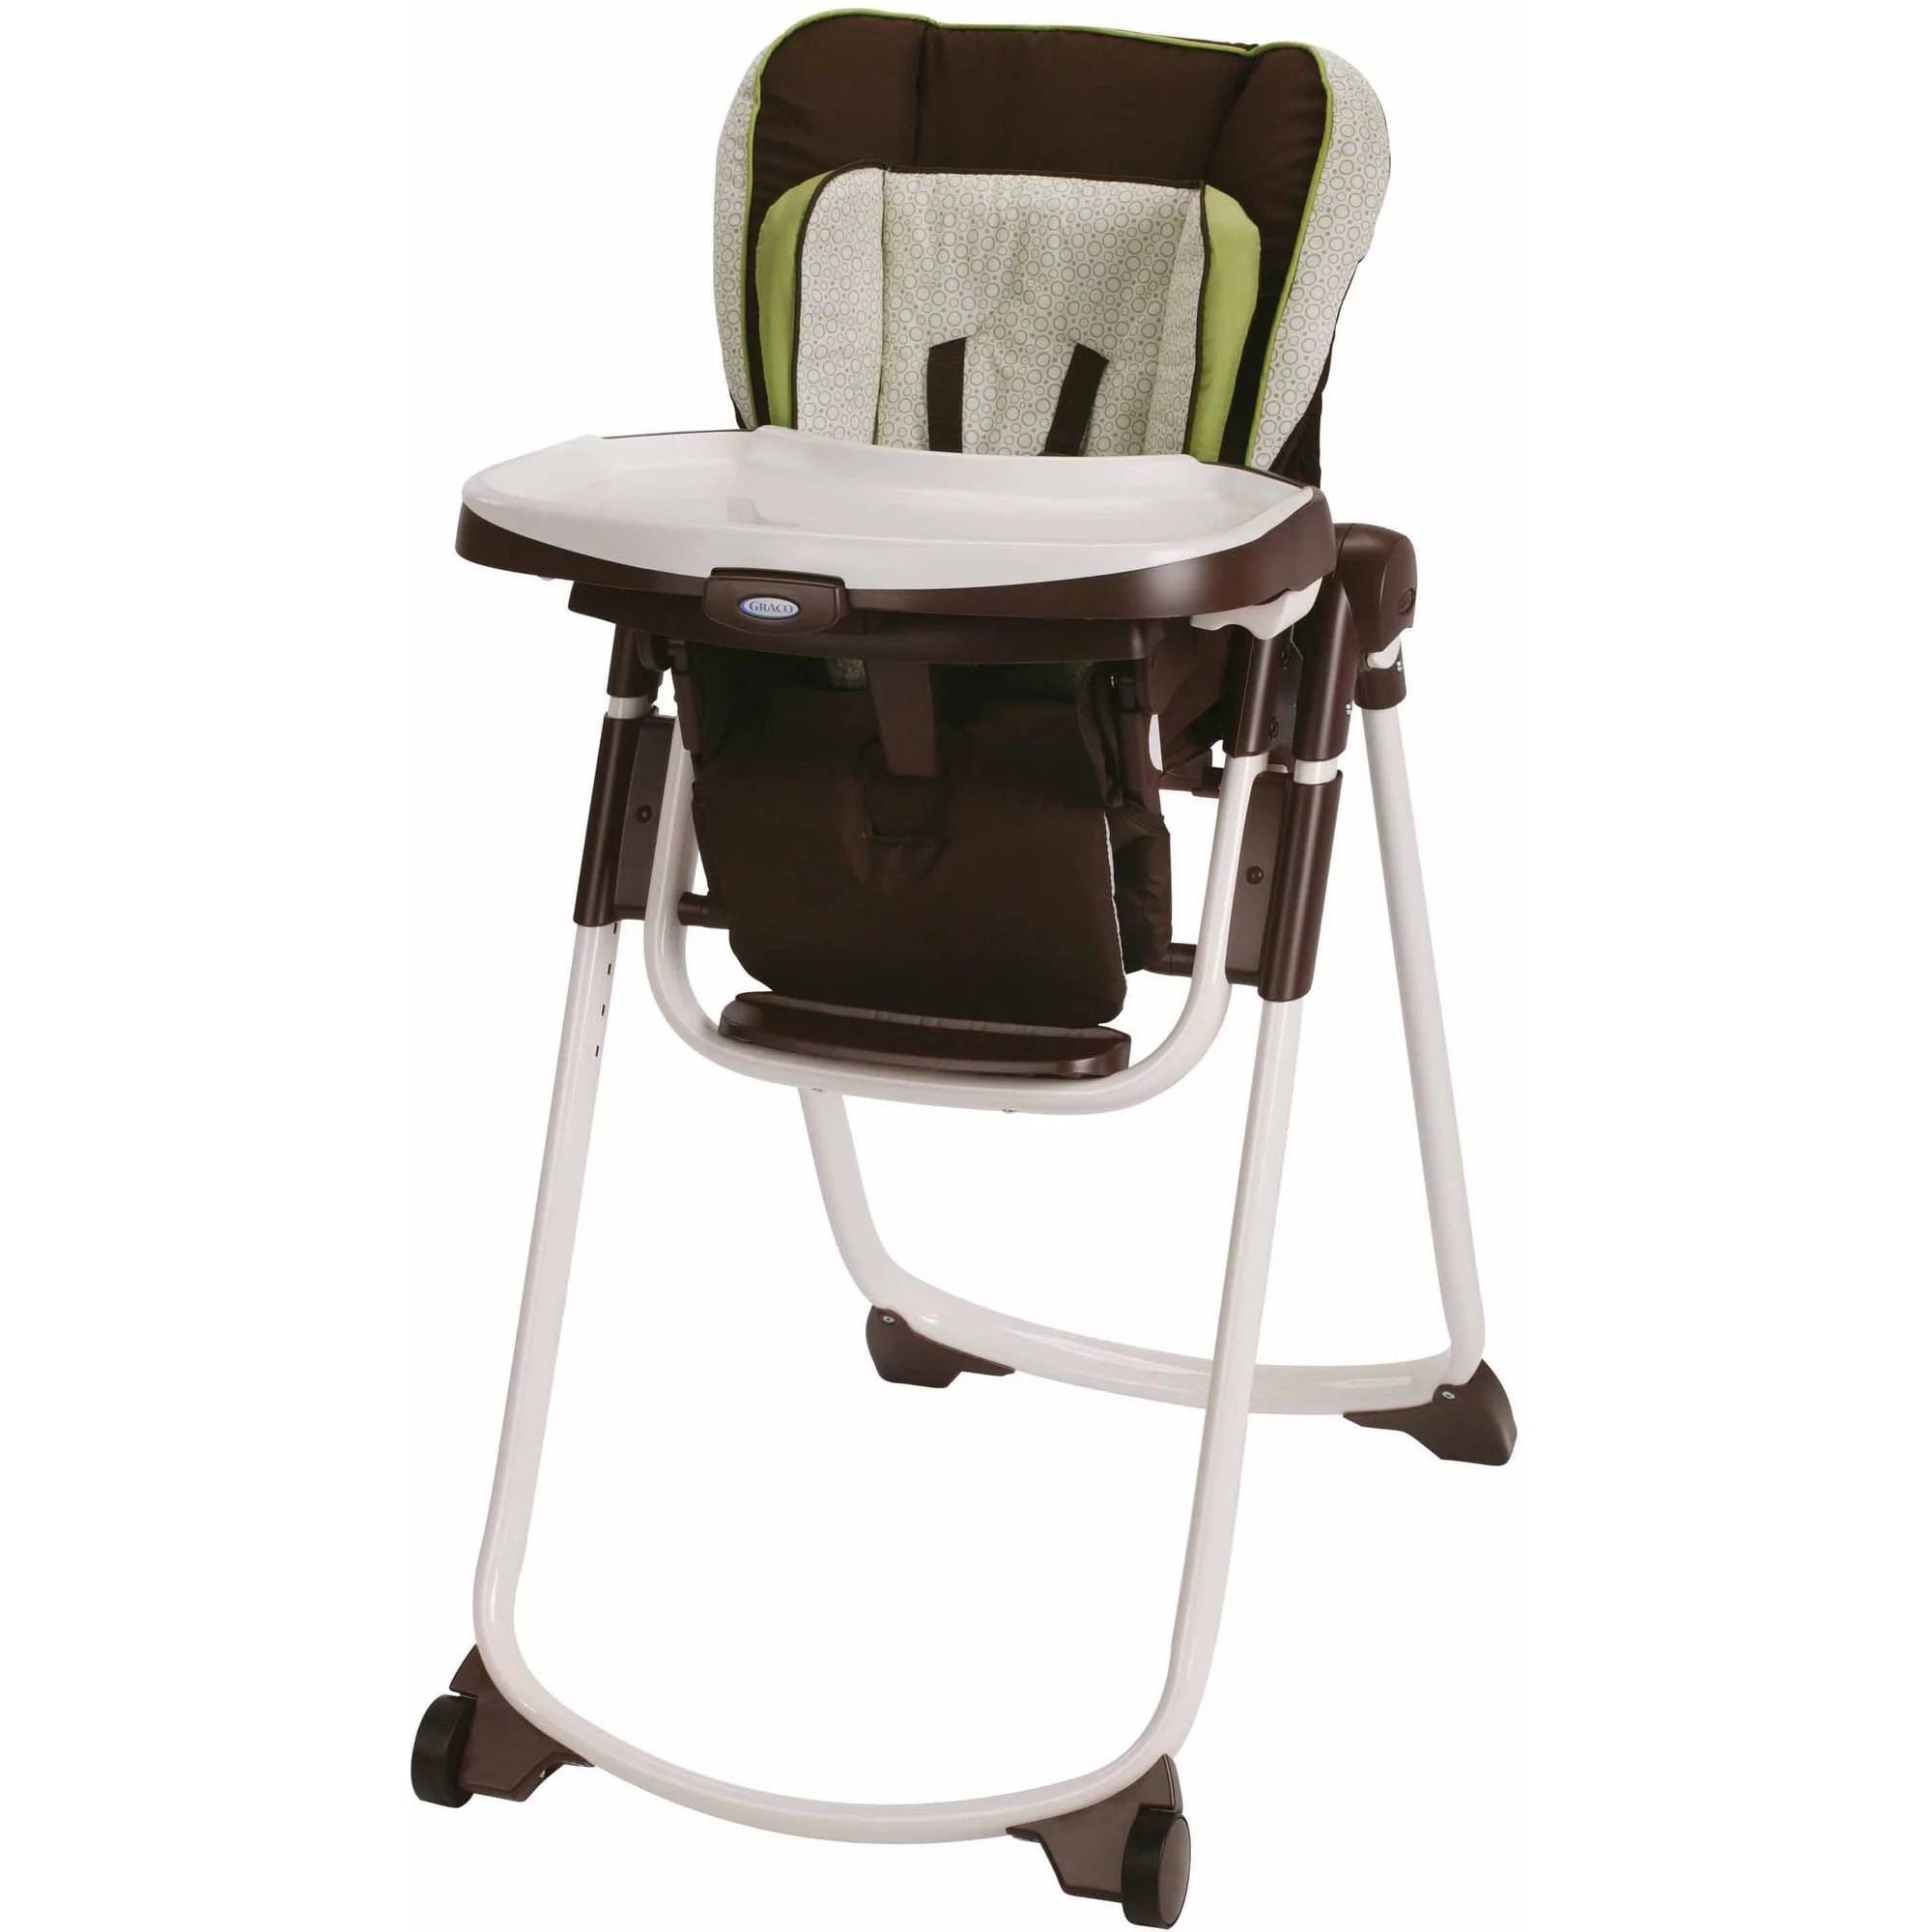 Graco Slim Spaces Space Saver High Chair Go Green